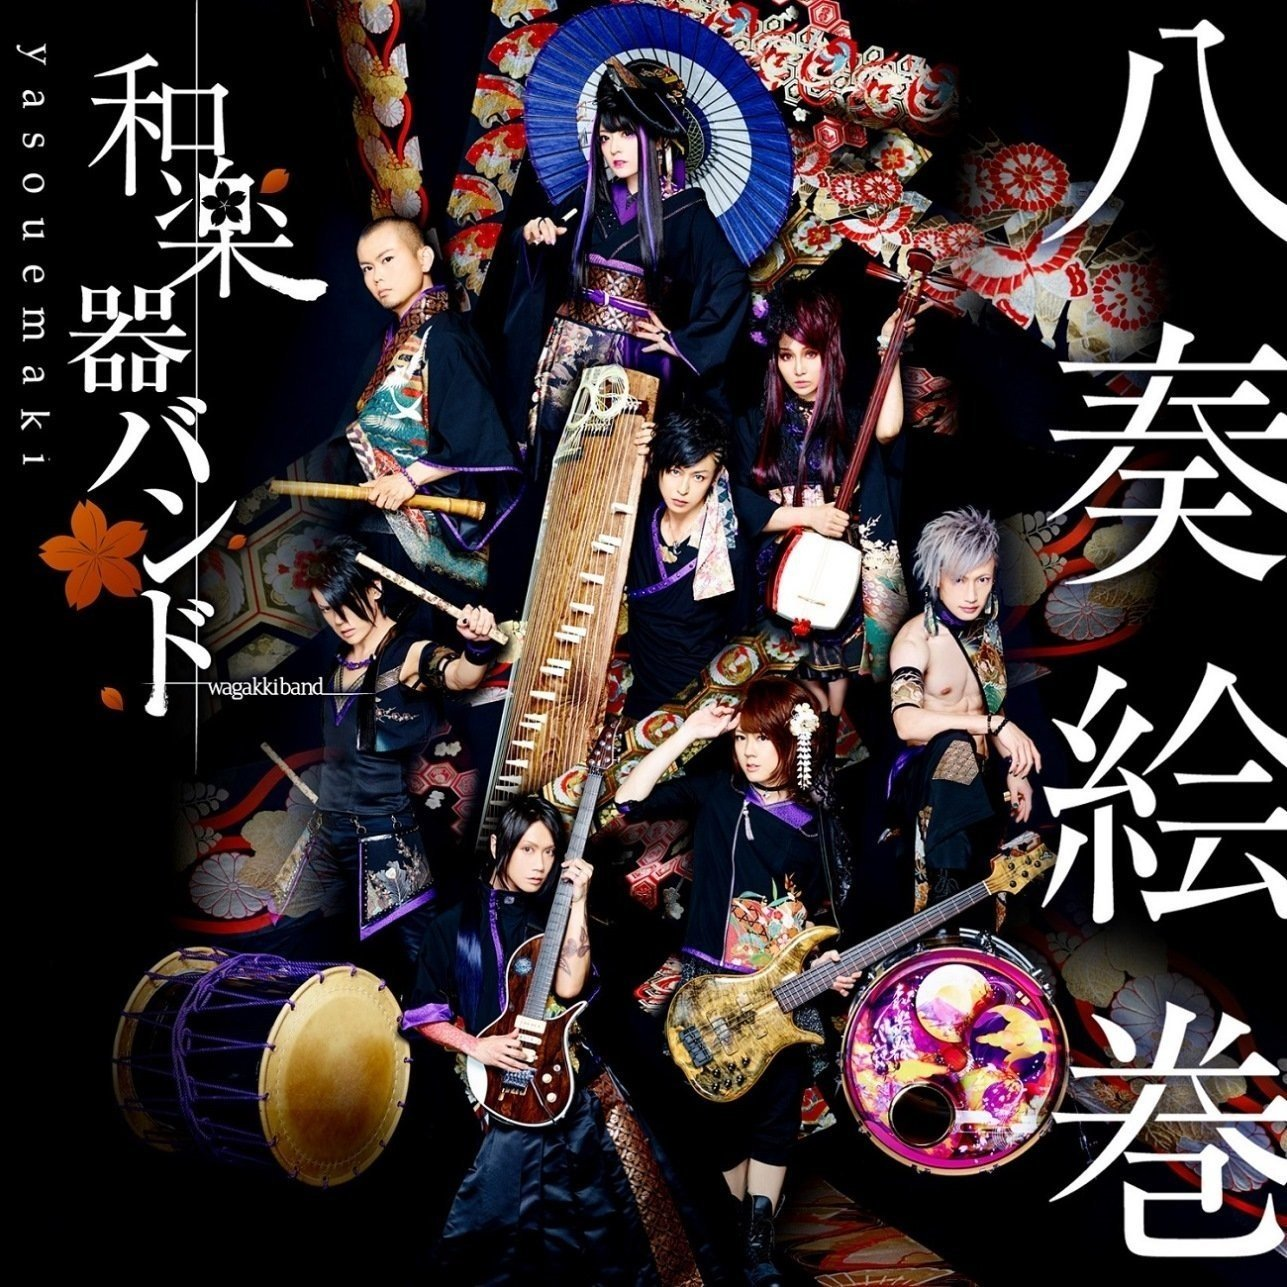 Download Wagakki band Yasou Emaki Flac